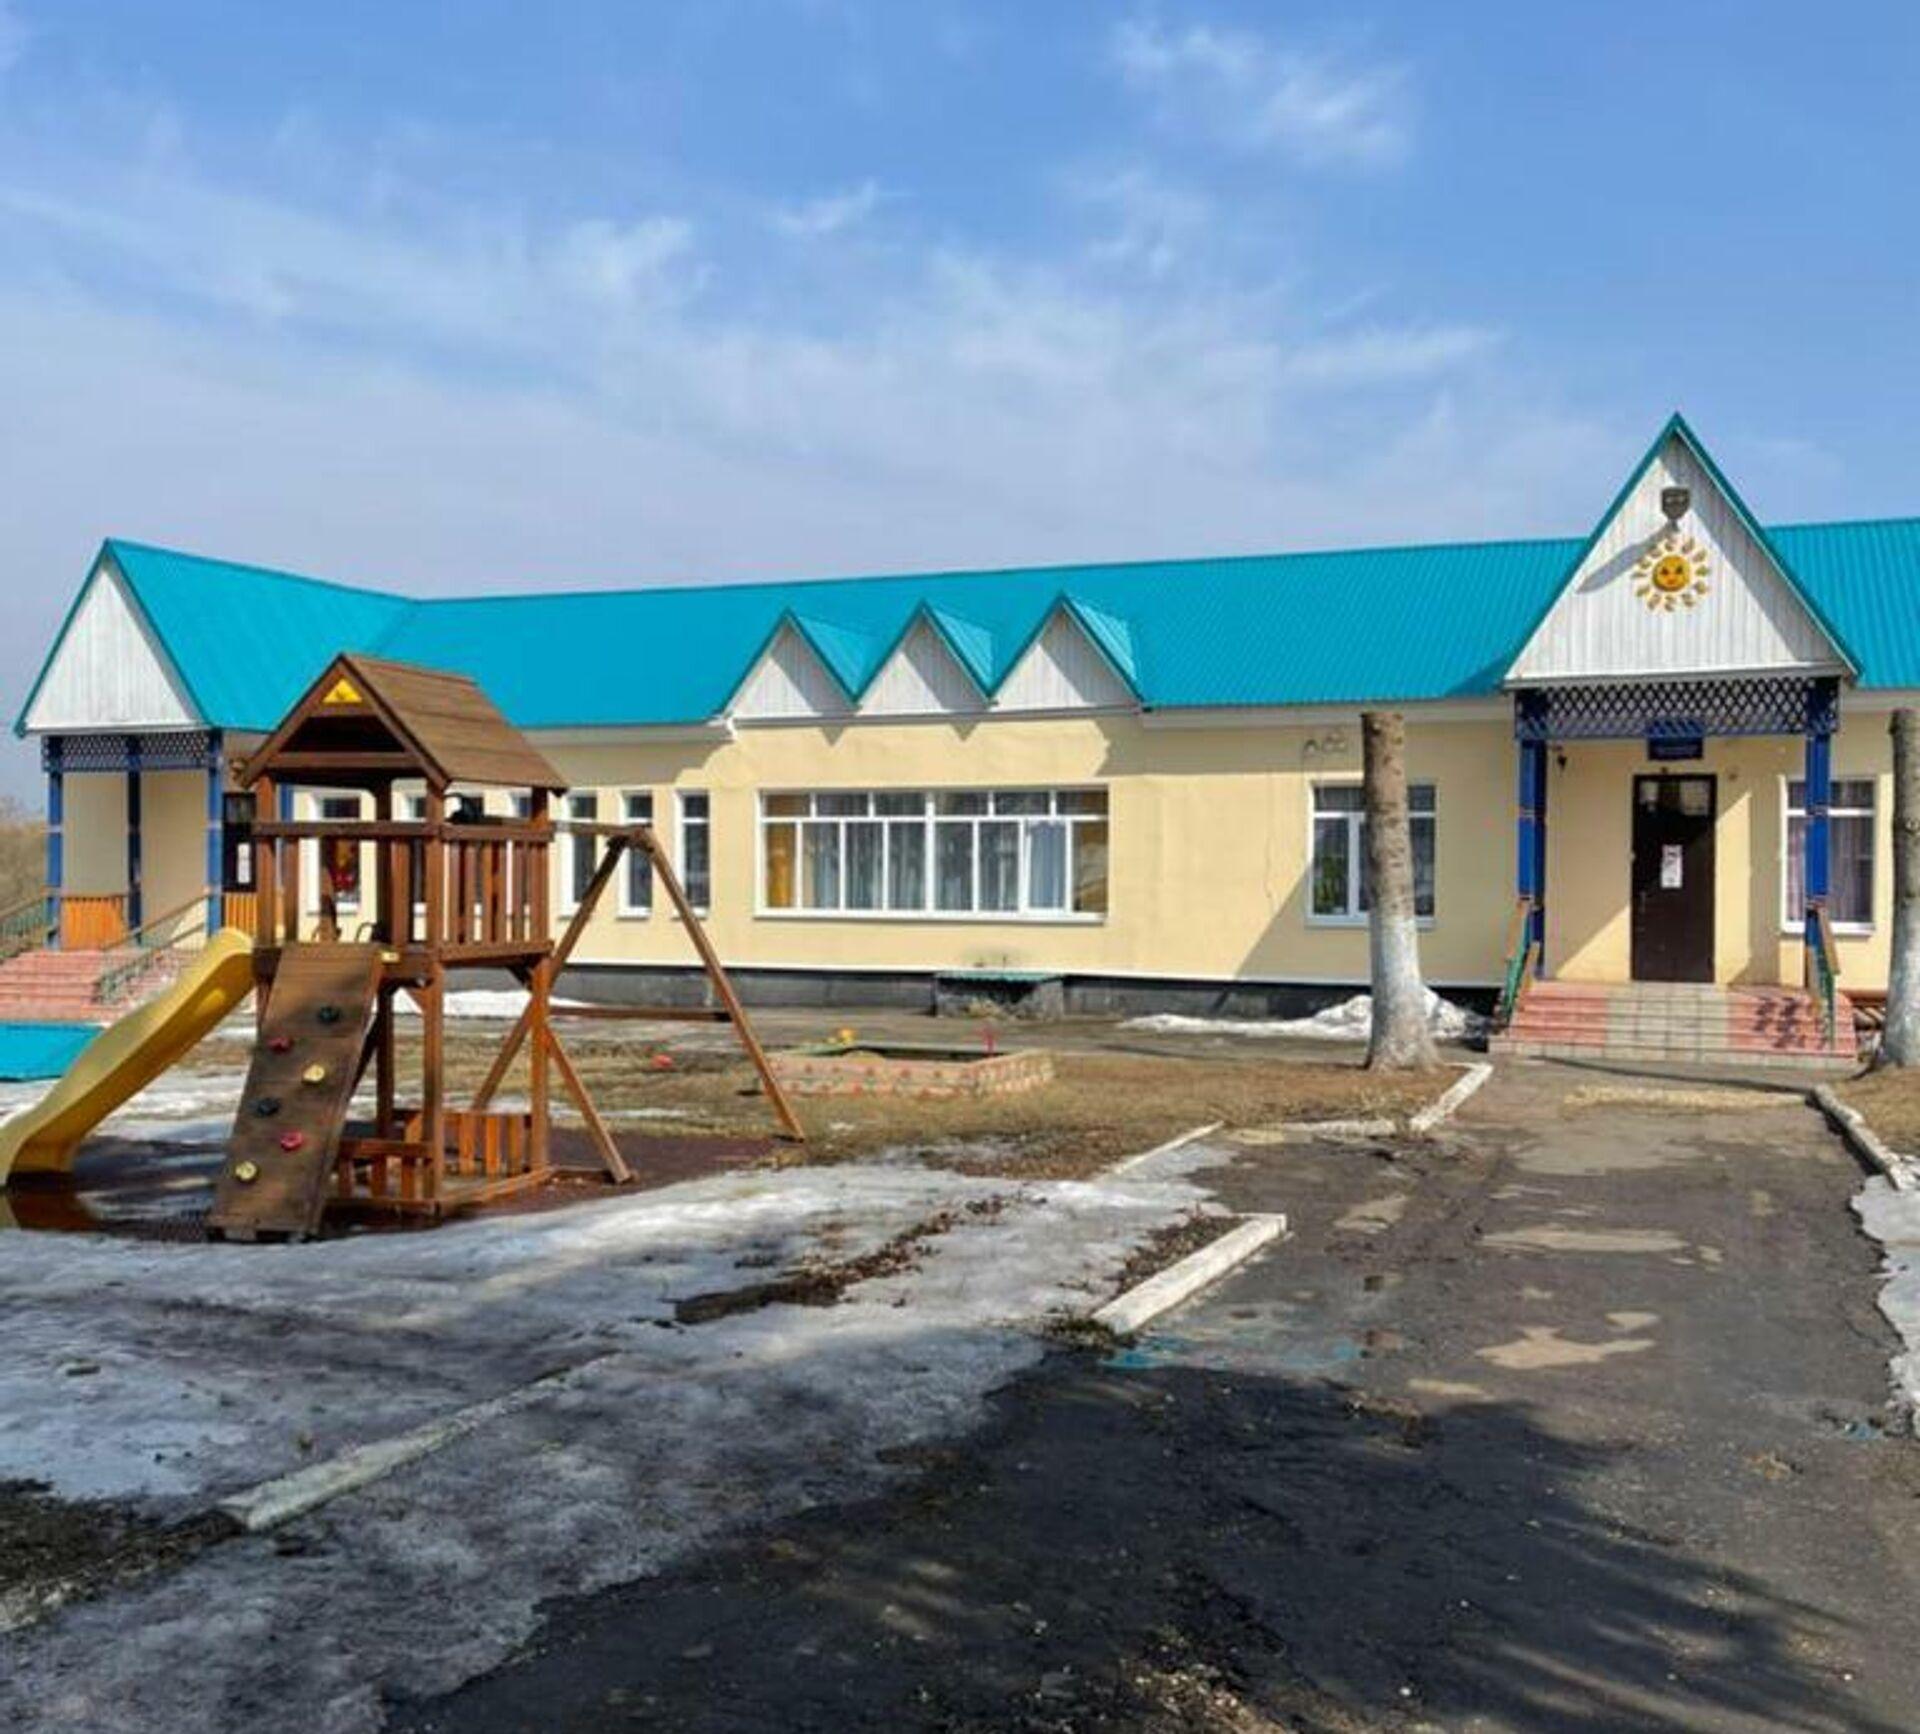 Детский сад - РИА Новости, 1920, 06.04.2021